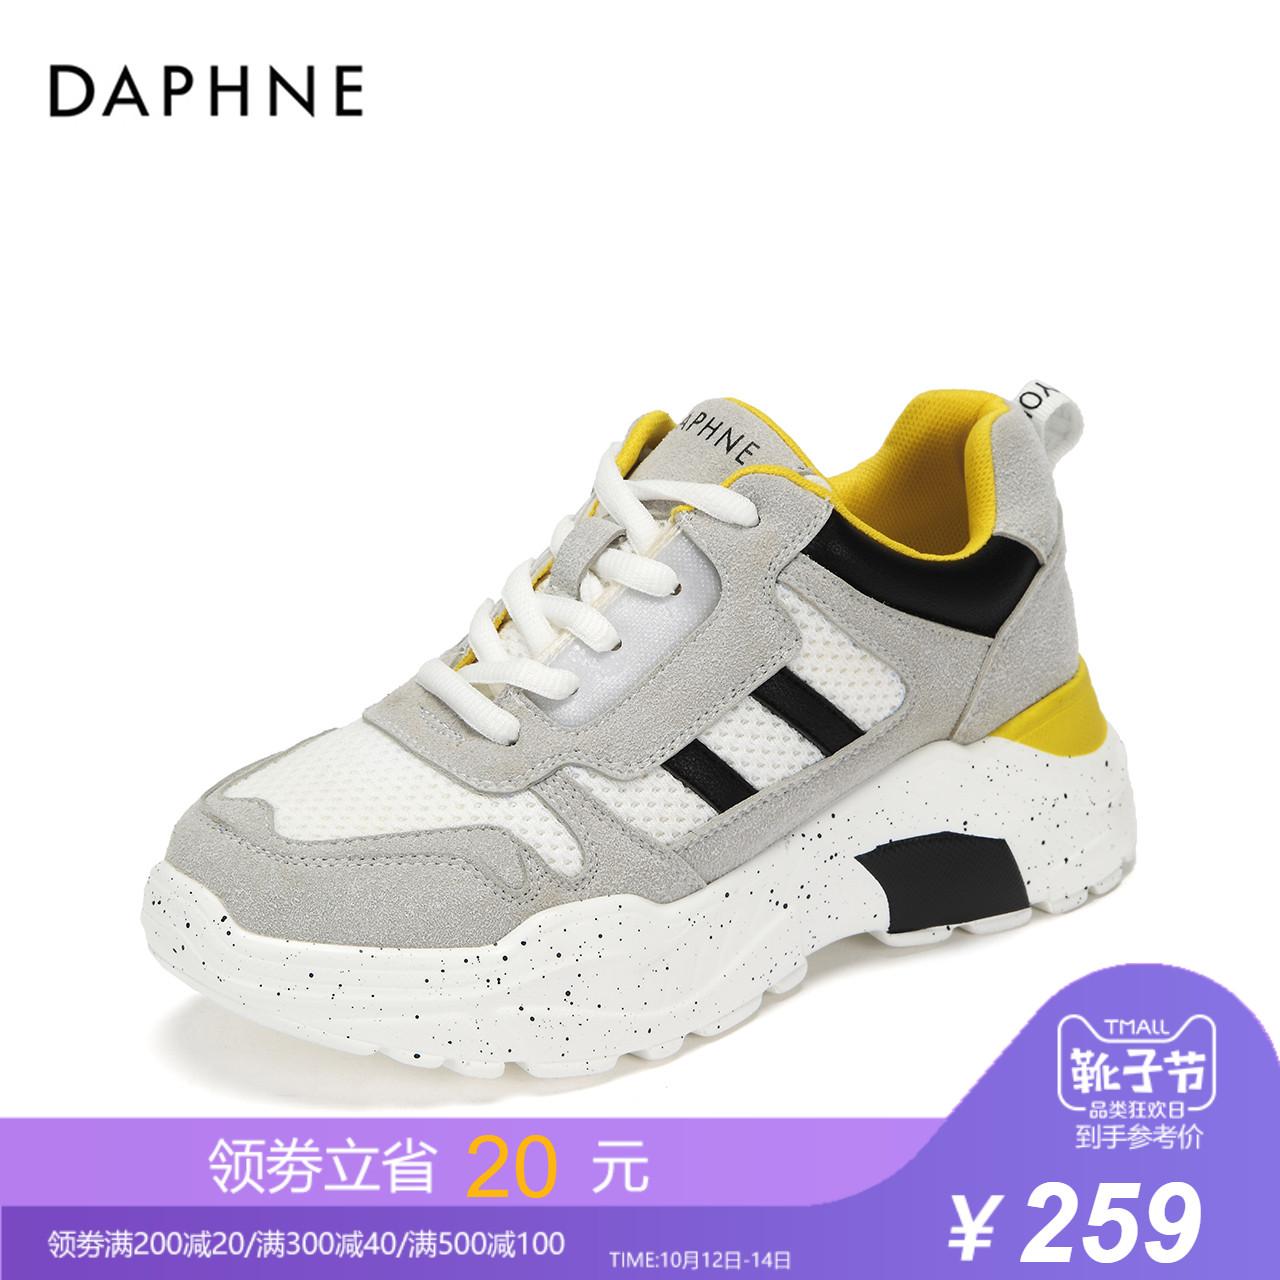 Daphne-达芙妮2018秋新款舒适撞色复古厚底运动鞋女